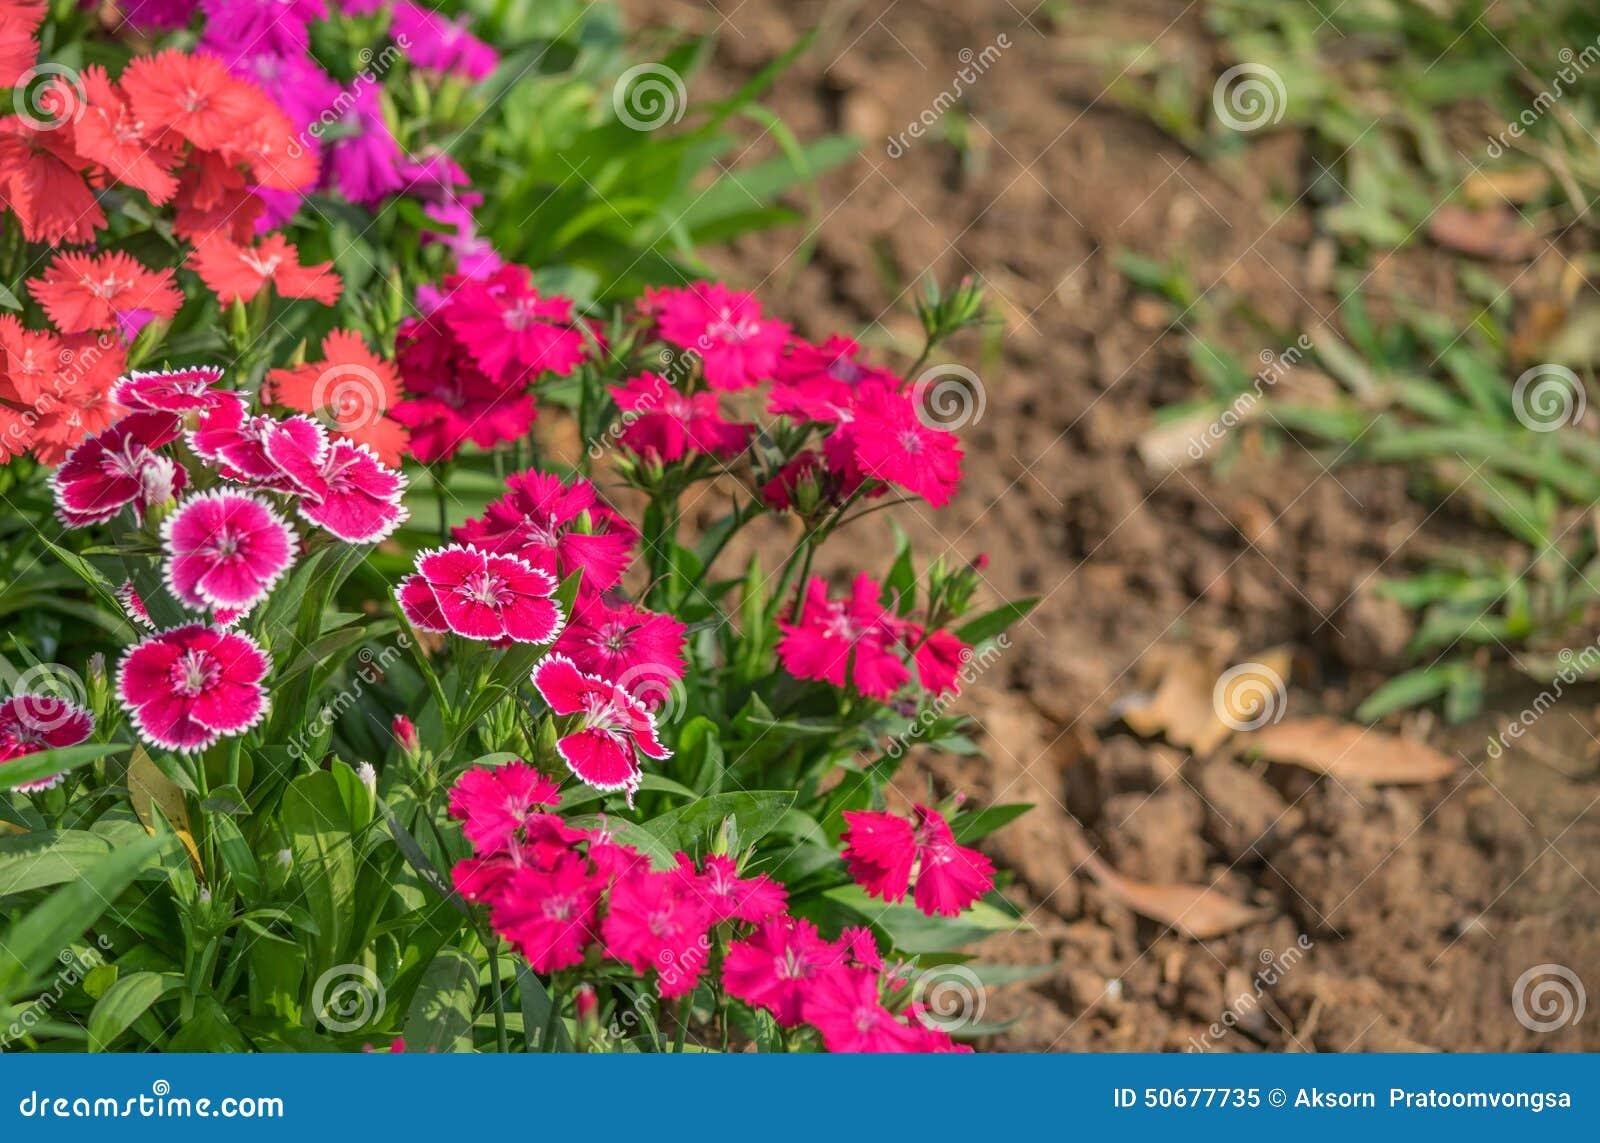 Download 石竹中华的花 库存图片. 图片 包括有 本质, 精美, 绿色, 雏菊, 五颜六色, 绽放, 对象, 关闭 - 50677735